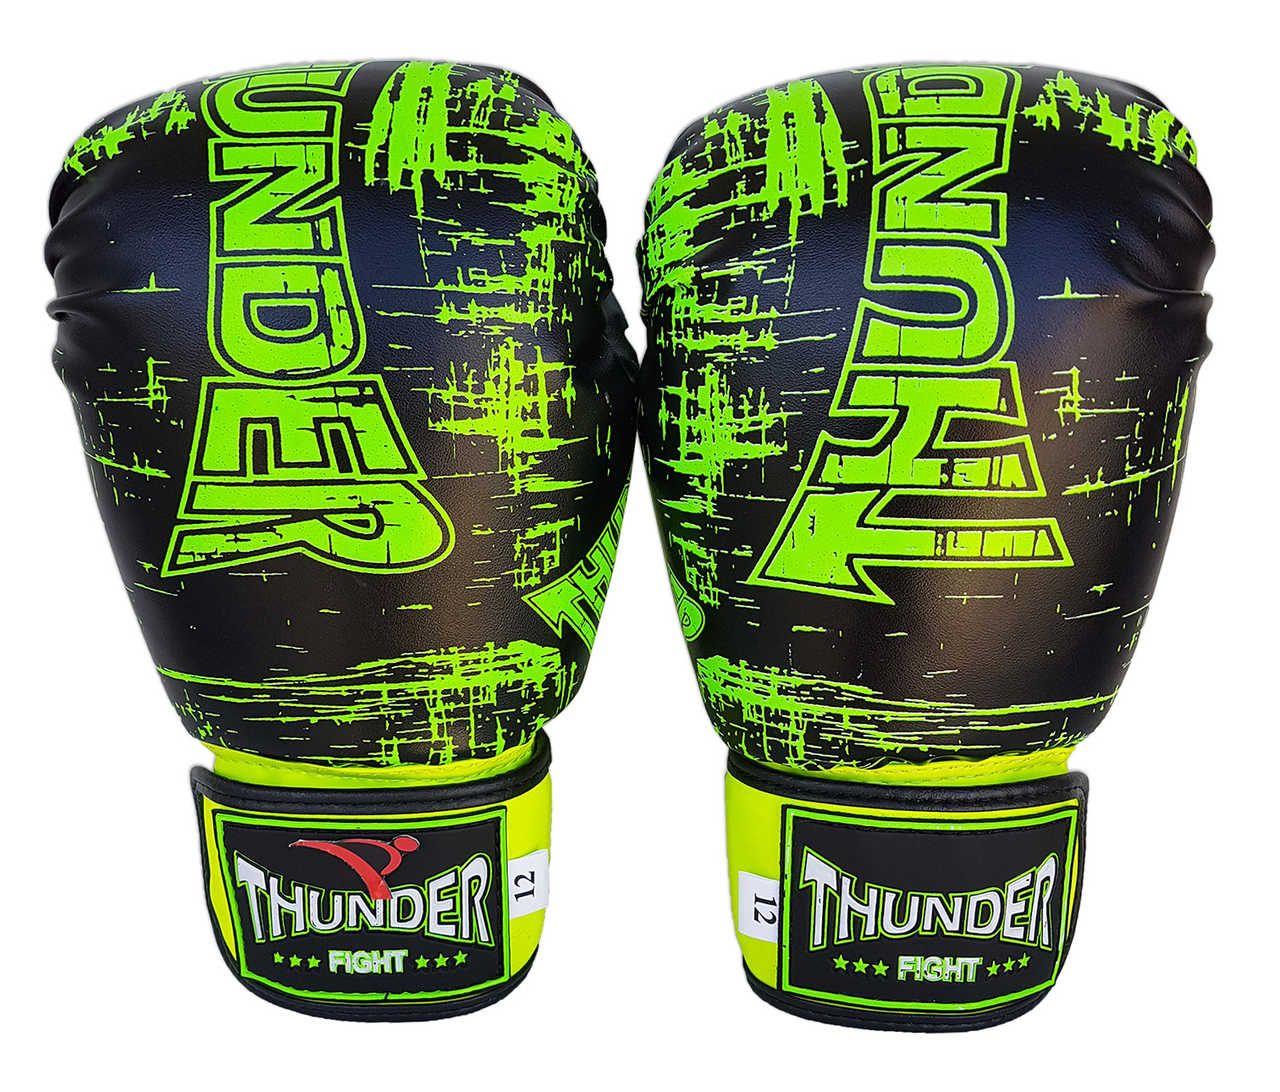 Kit de Boxe / Muay Thai 16oz - Preto Riscado Verde  - Thunder Fight  - PRALUTA SHOP